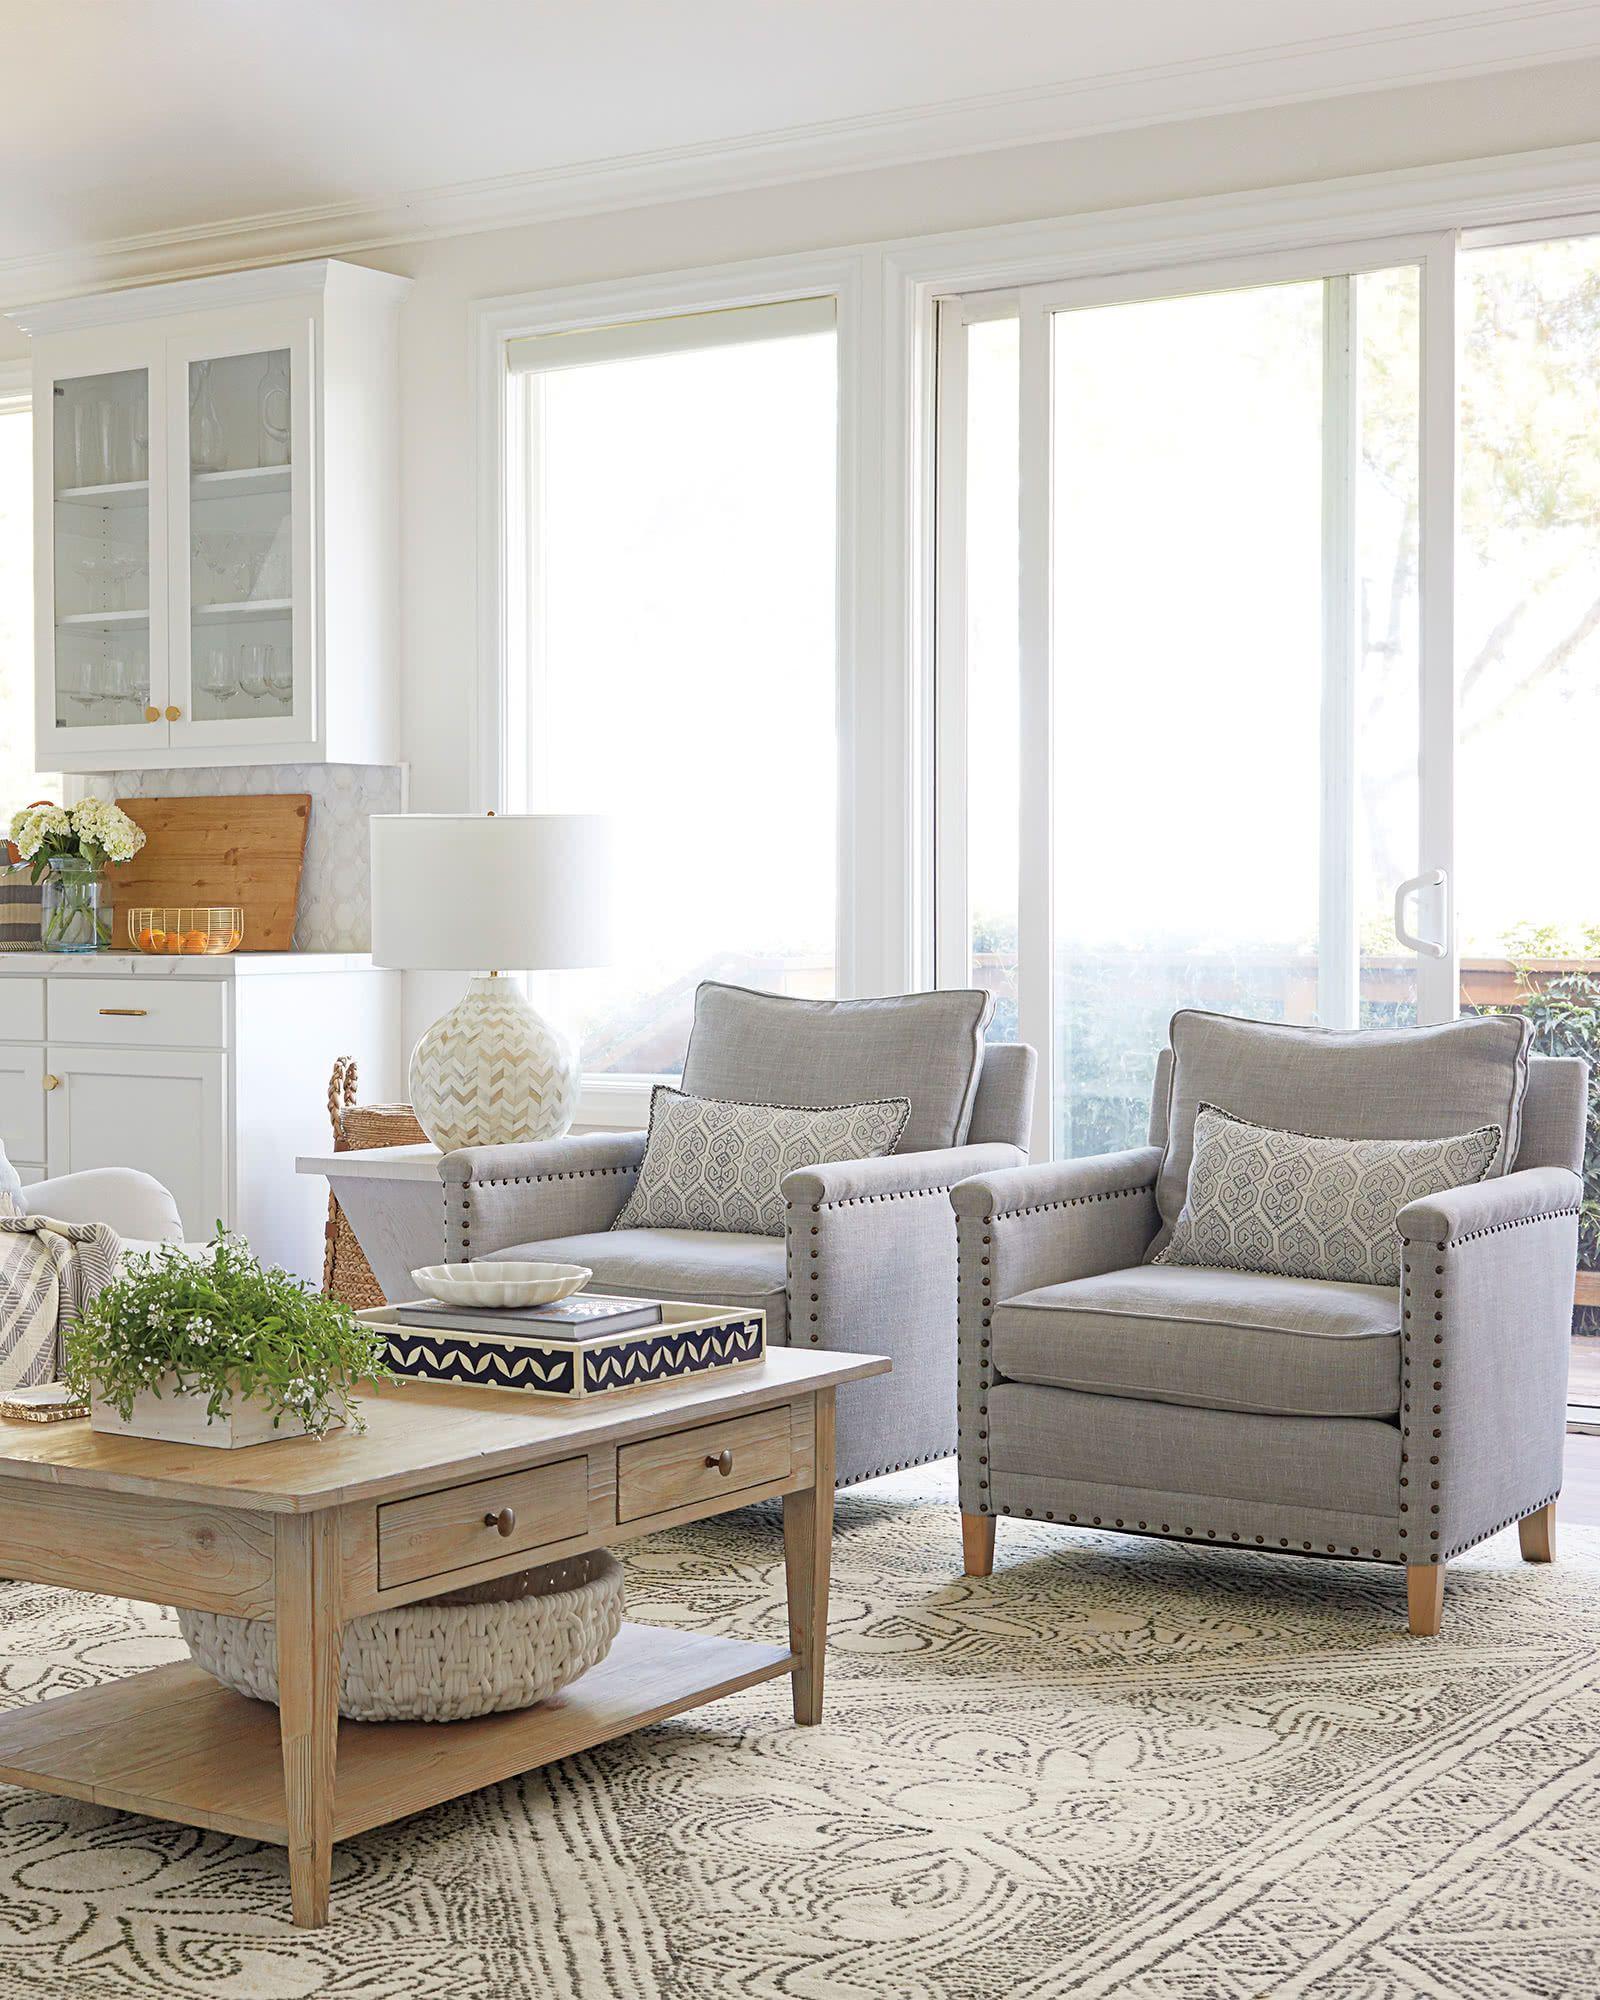 Inspiring Sunroom Design Tips And Ideas